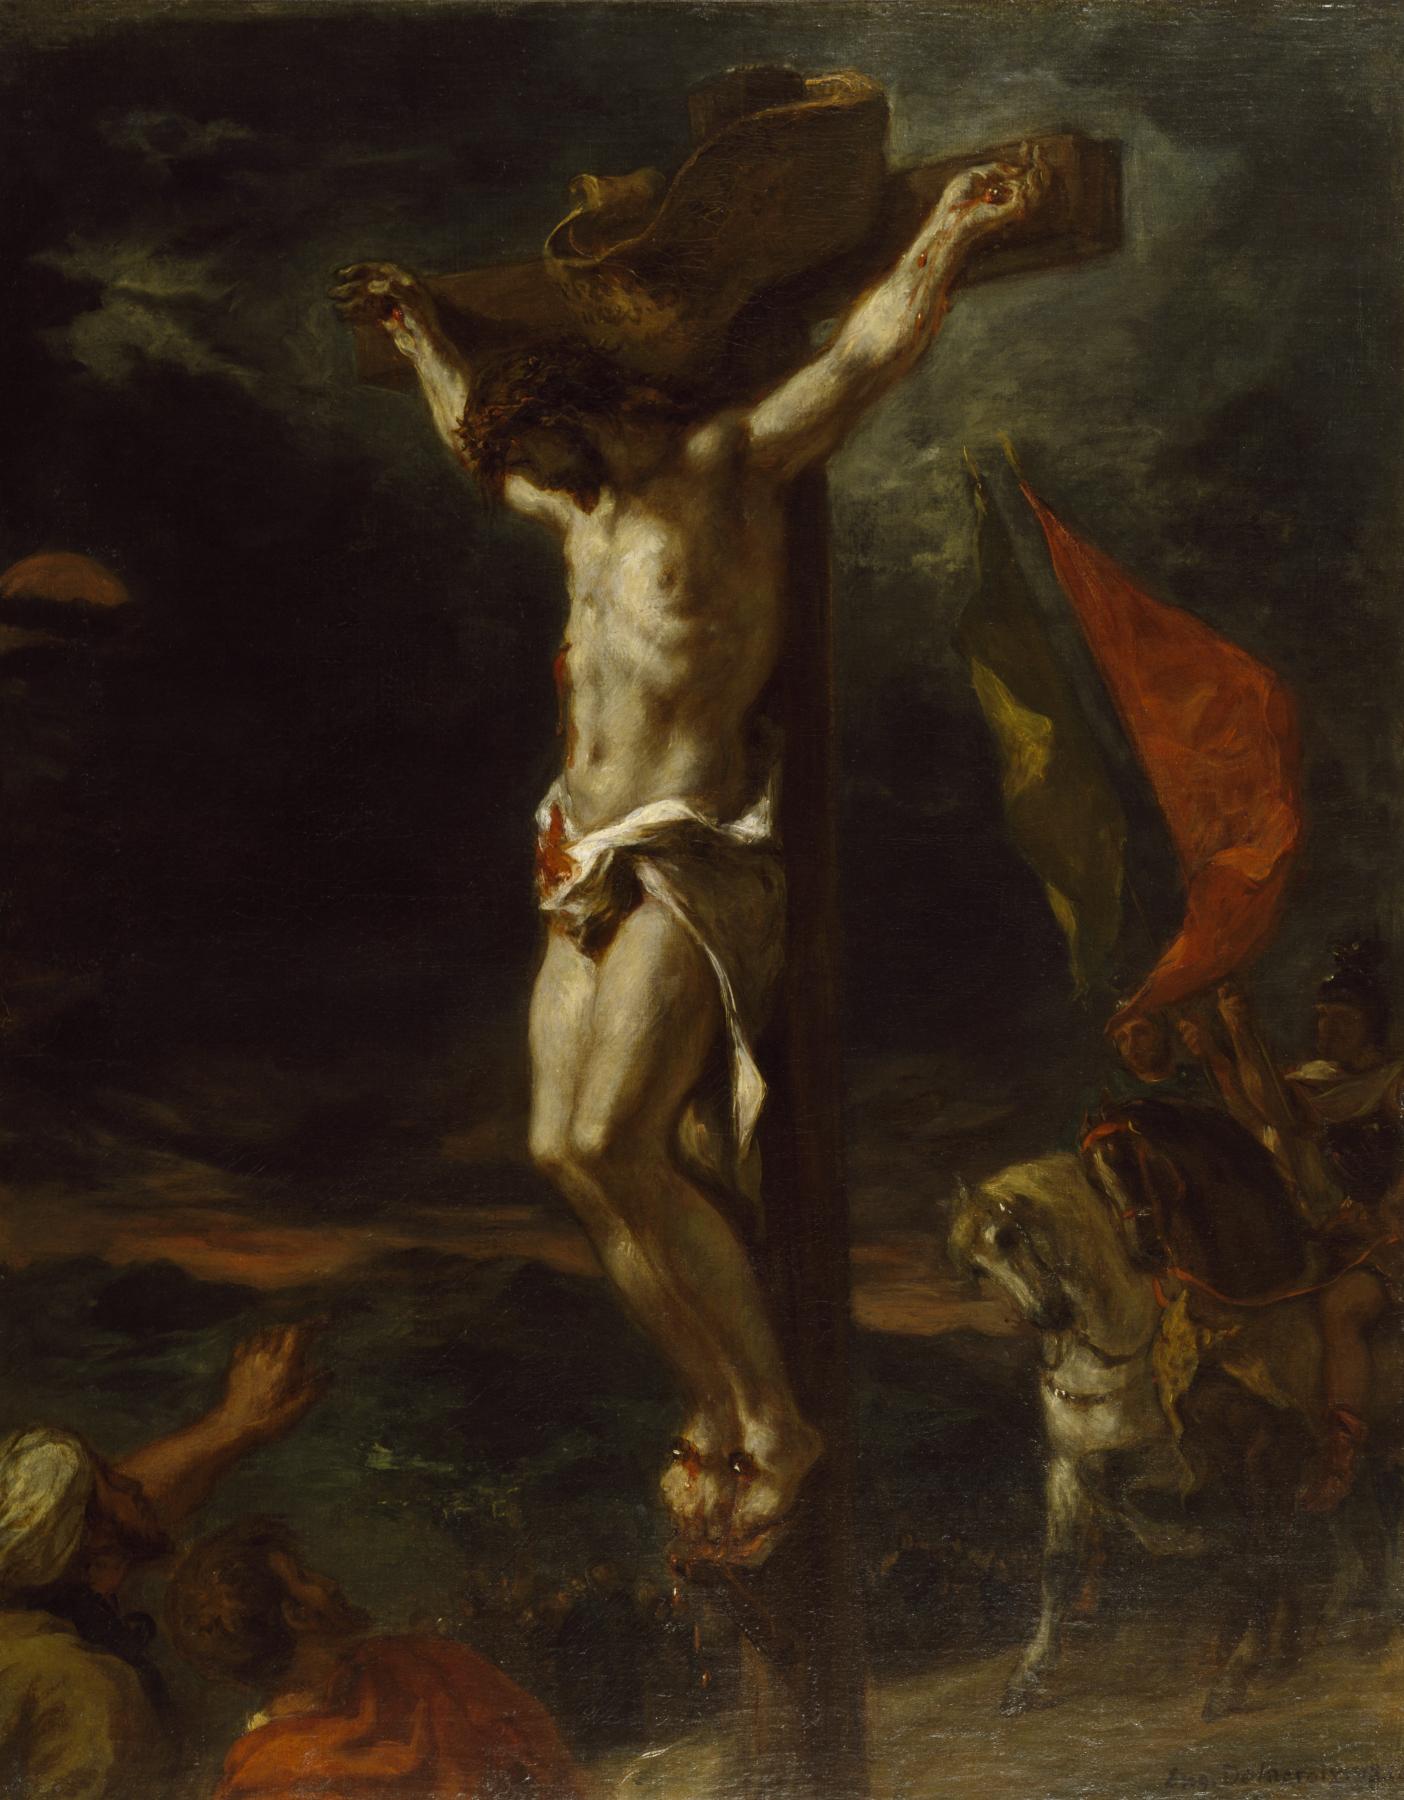 http://upload.wikimedia.org/wikipedia/commons/d/d2/Eug%C3%A8ne_Delacroix_-_Christ_on_the_Cross_-_Walters_3762_(2).jpg